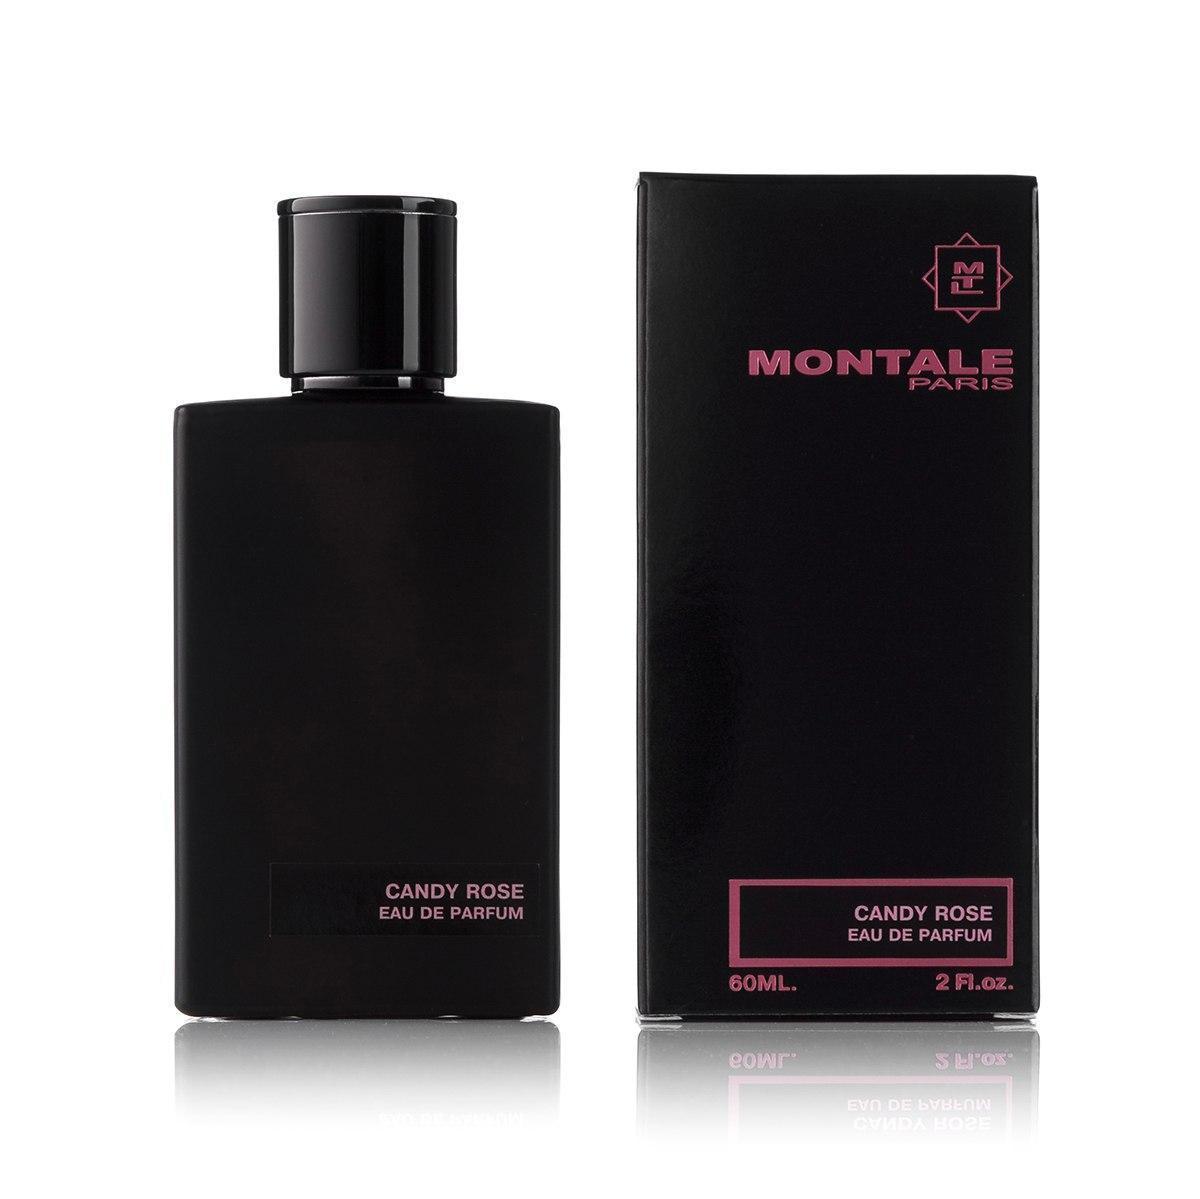 Мини парфюм 60 ml Montale  Candy Rose (Ж) -M-8